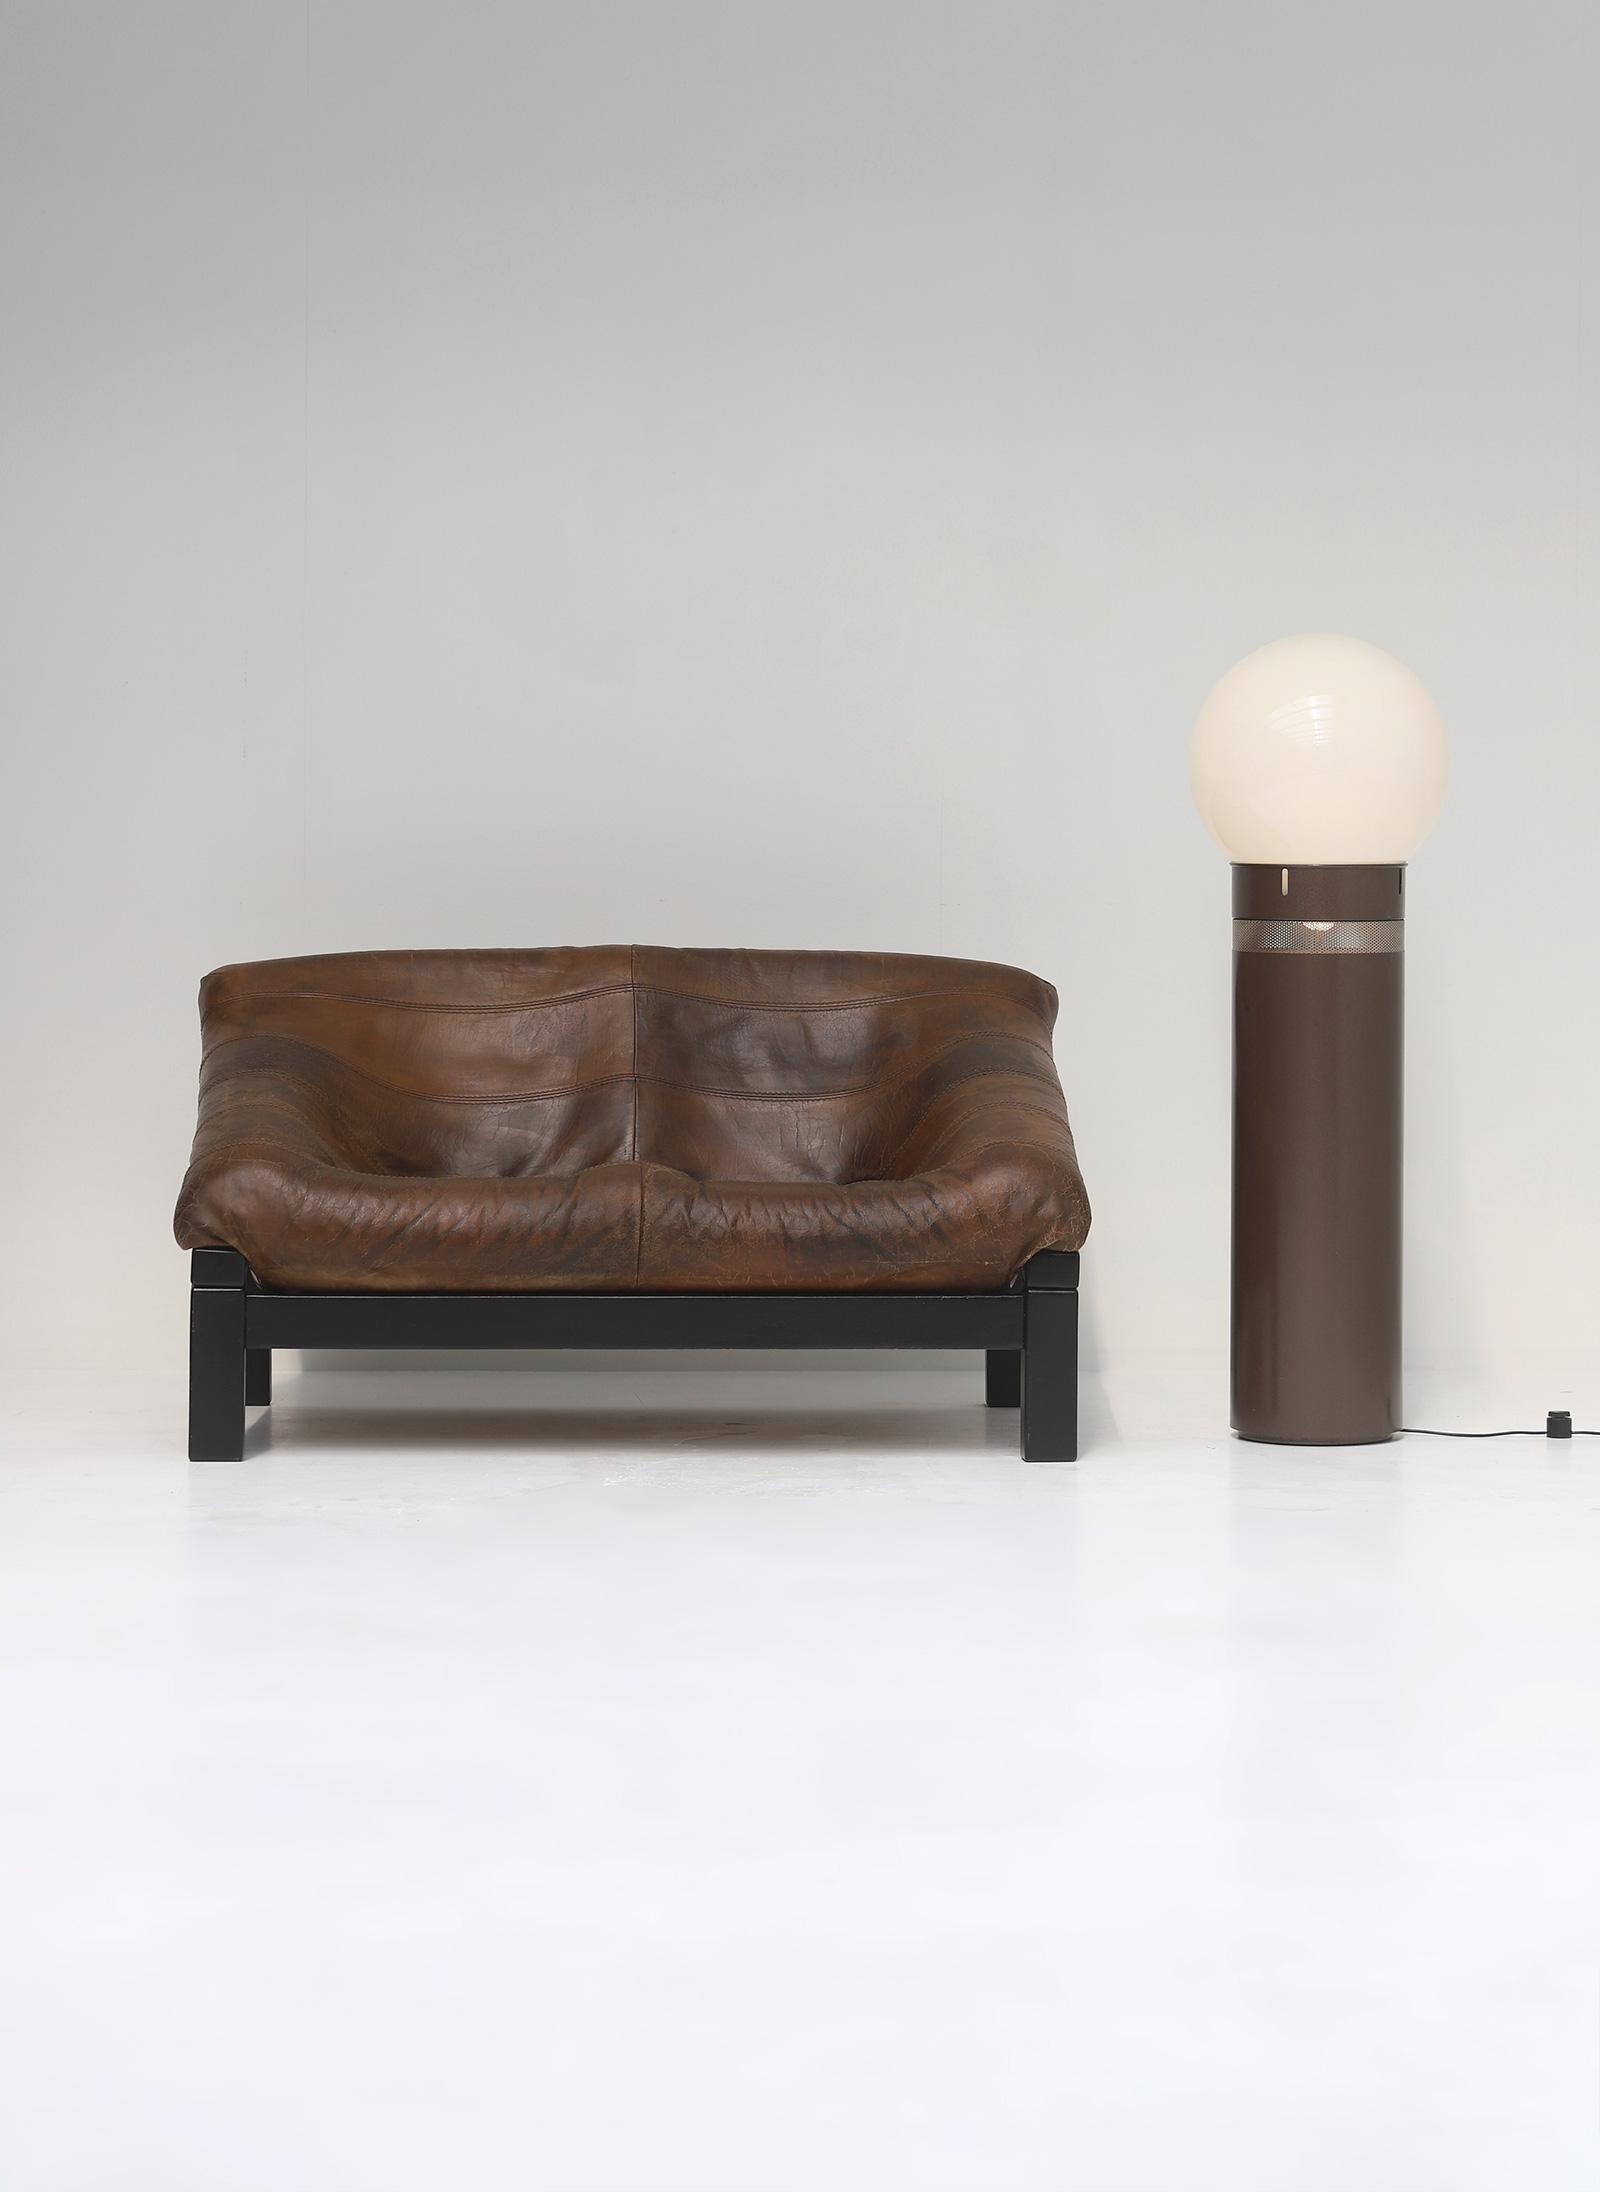 Decorative 2 seat leather Sofaimage 1